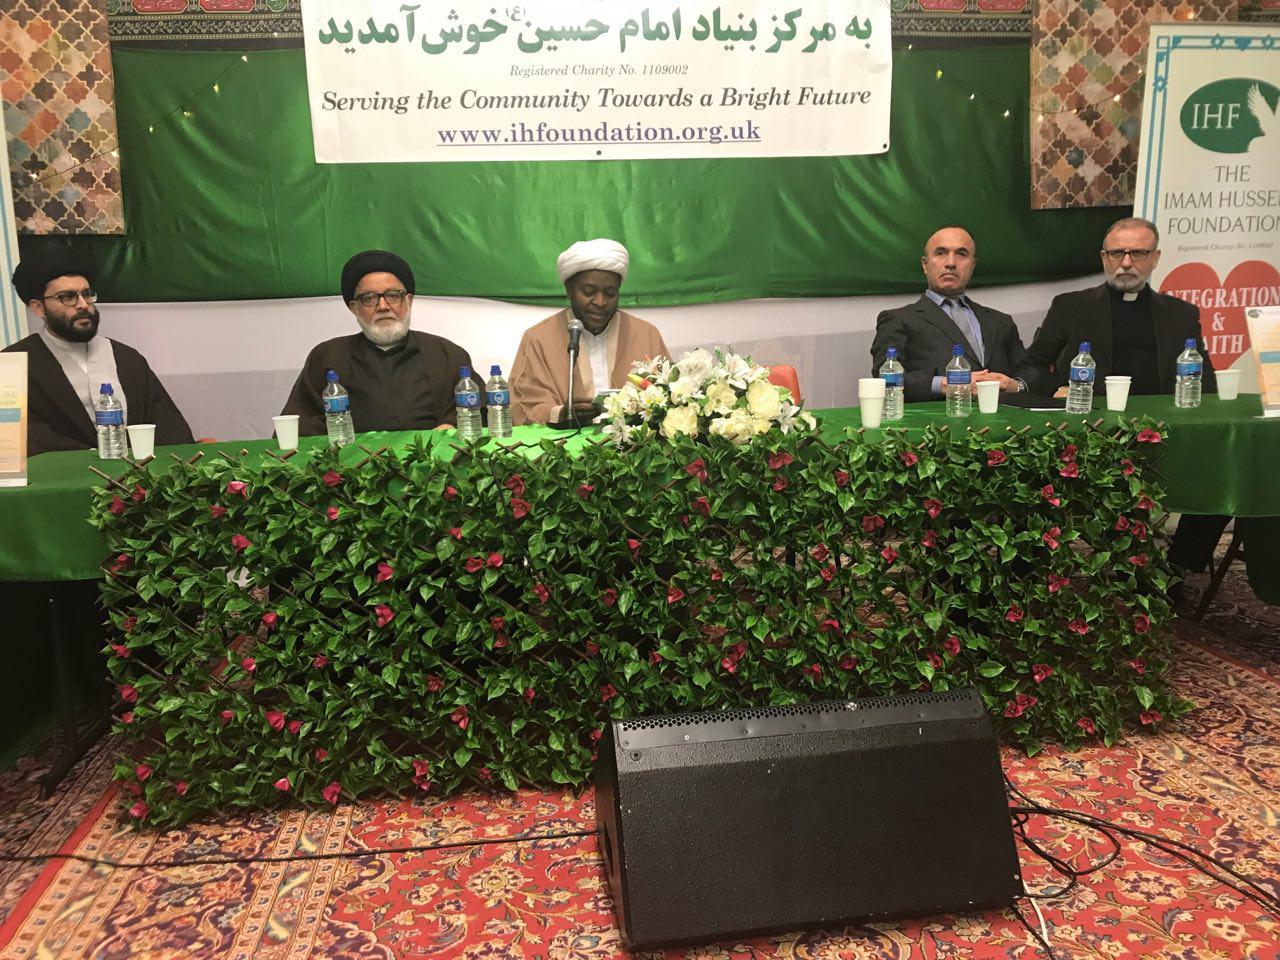 Photo of Imam Hussein Foundation organizes a multi-faith celebration